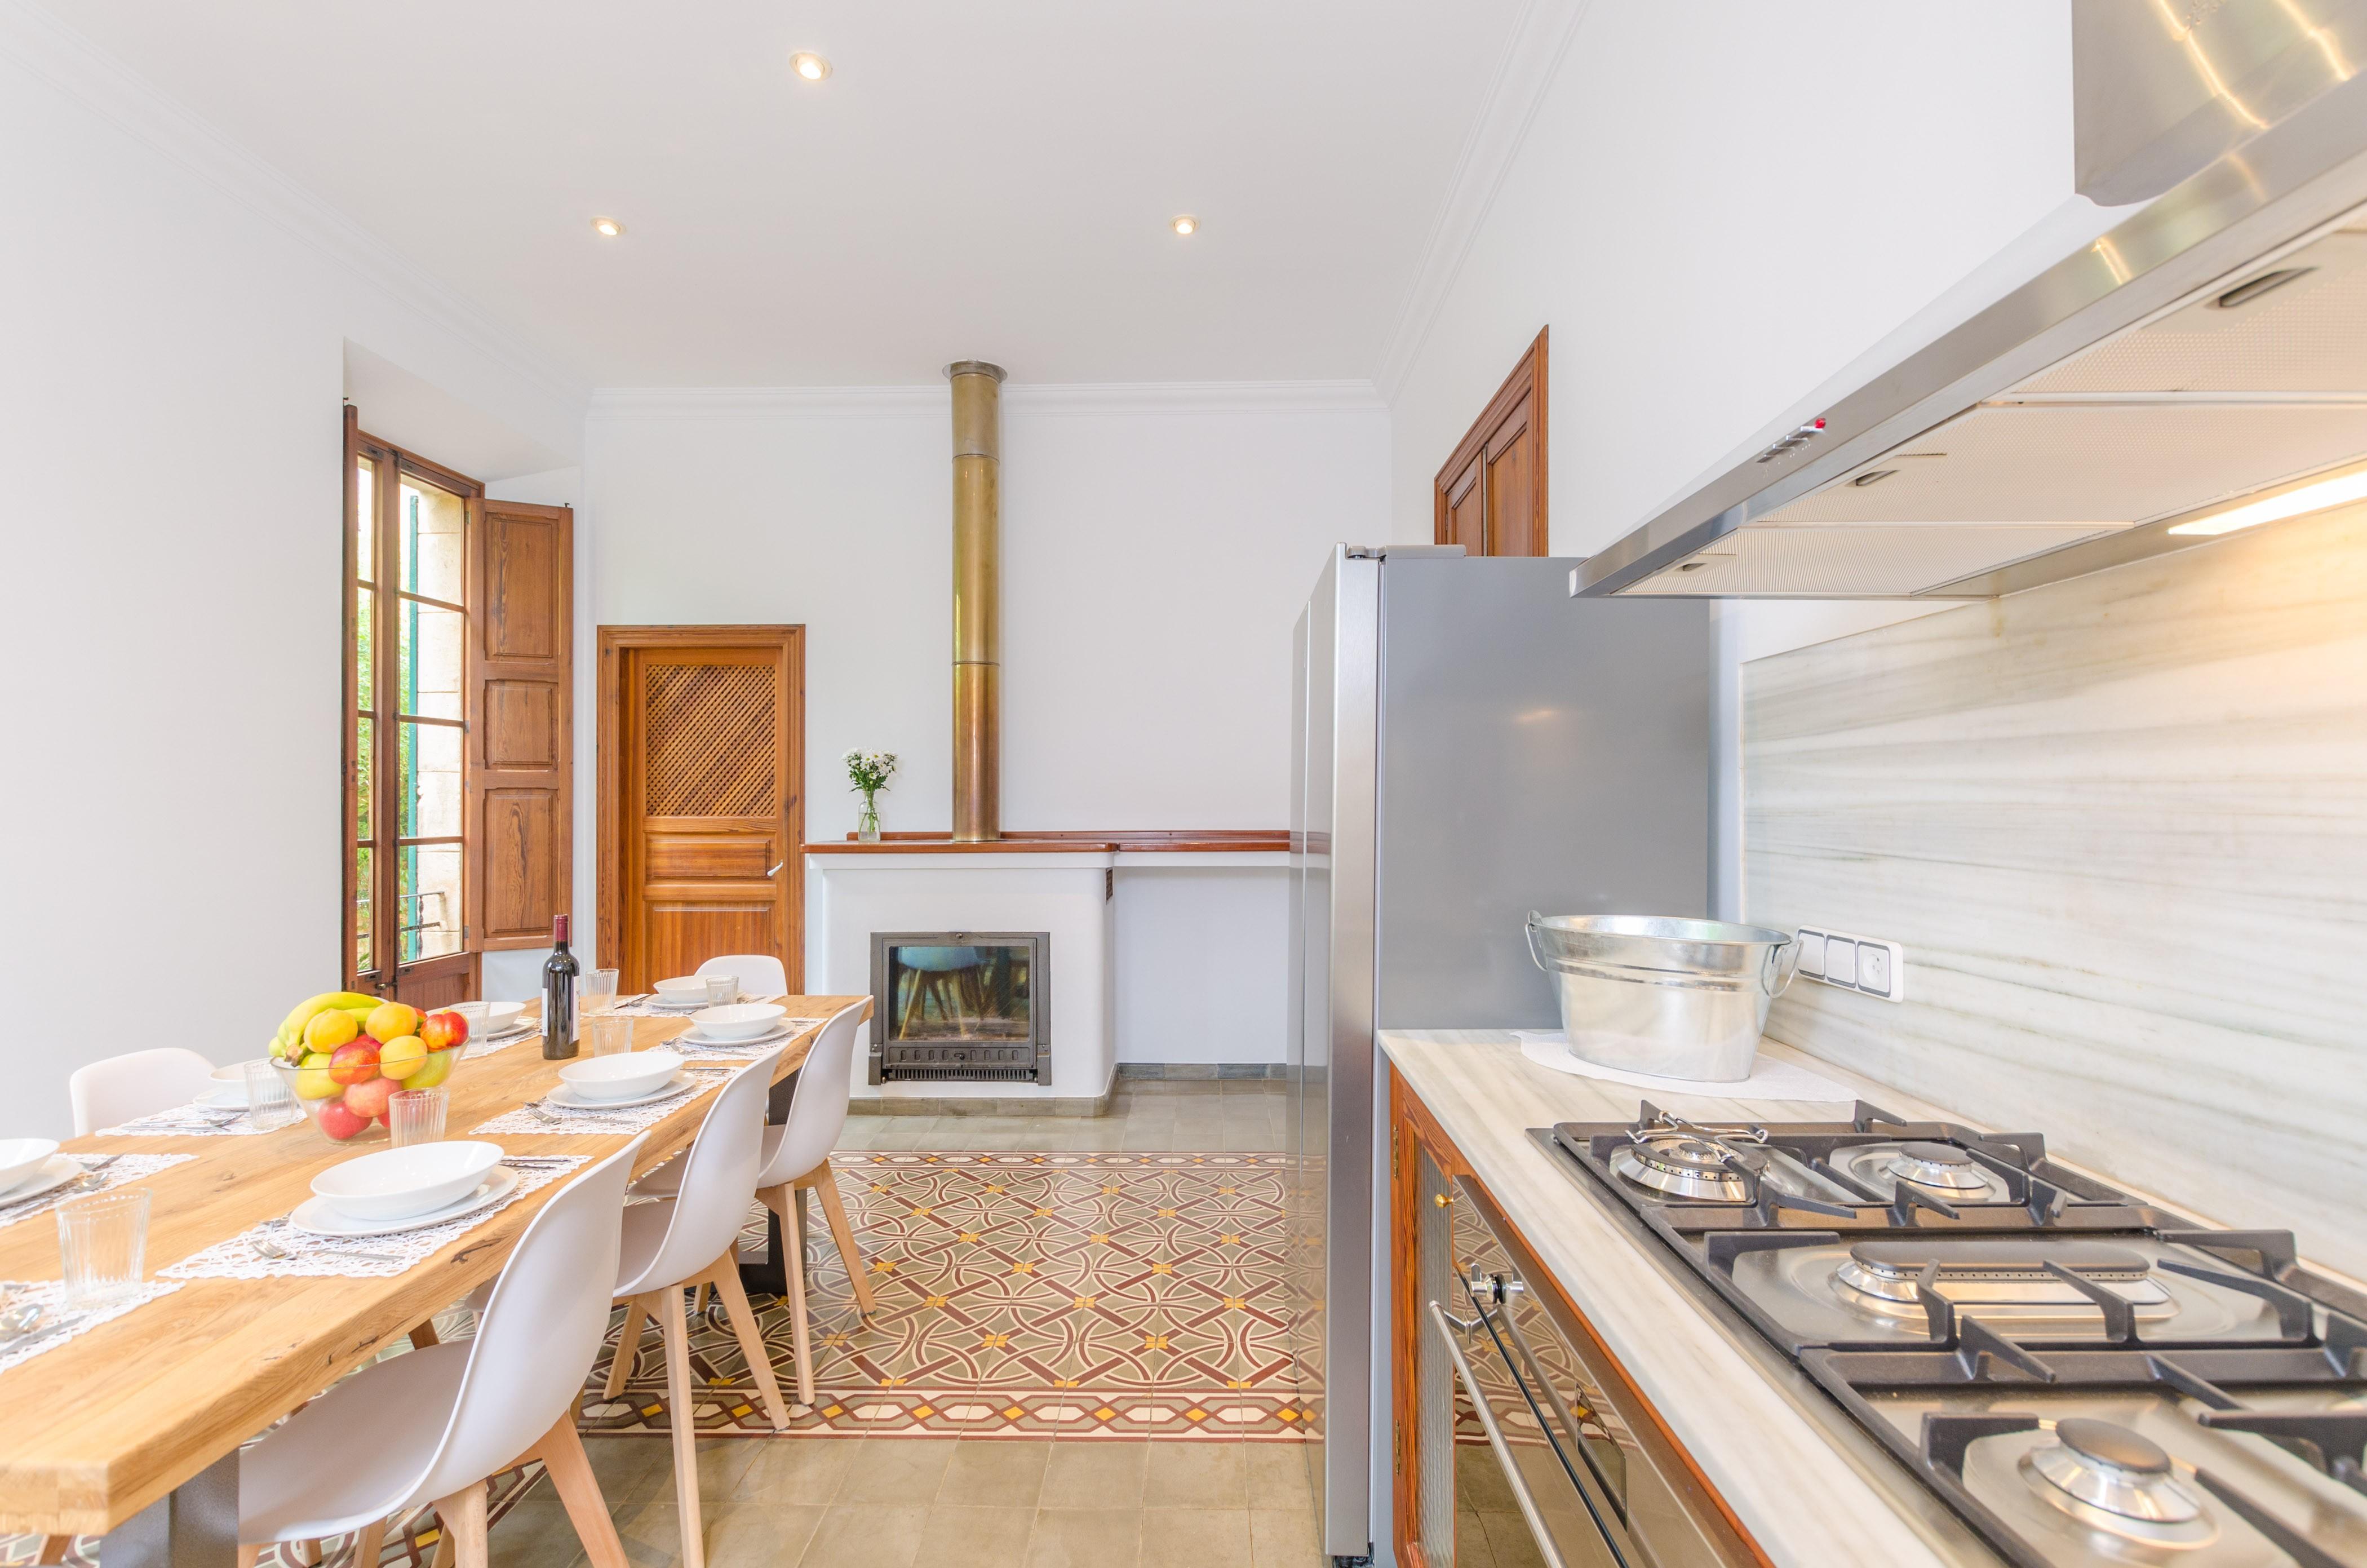 Maison de vacances CAS CONVIDATS (2435013), Alaro, Majorque, Iles Baléares, Espagne, image 27